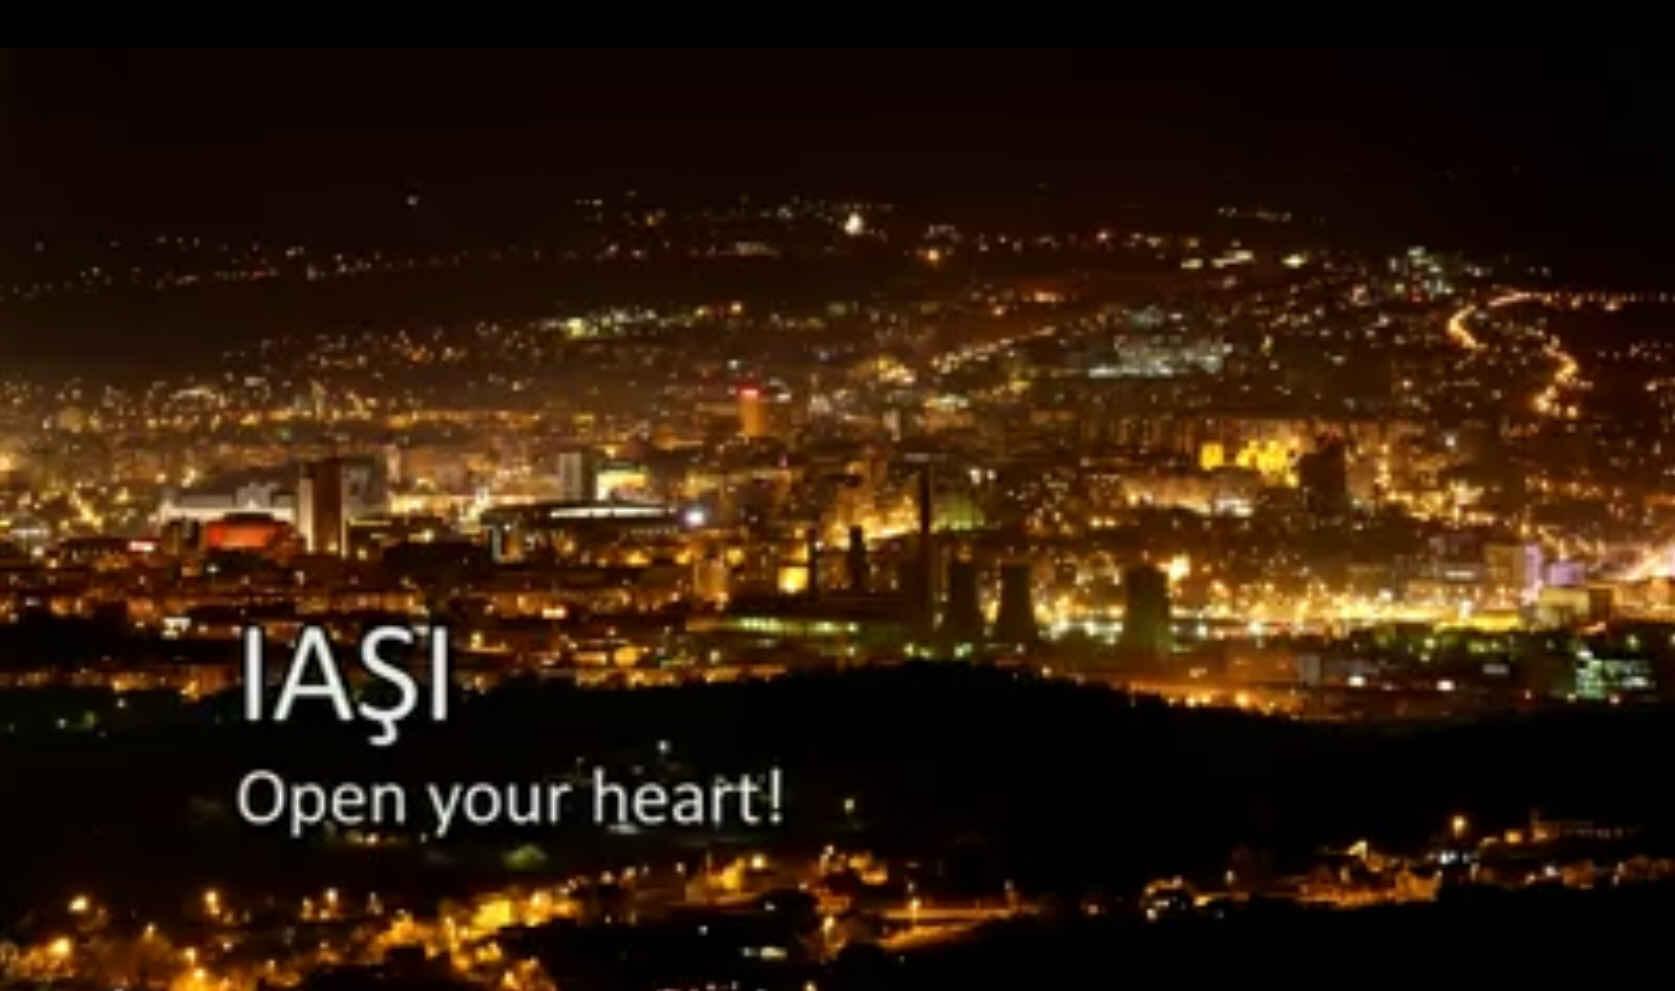 https://static.blog4ever.com/2014/01/761931/IASI_open_your_heart_01.jpg